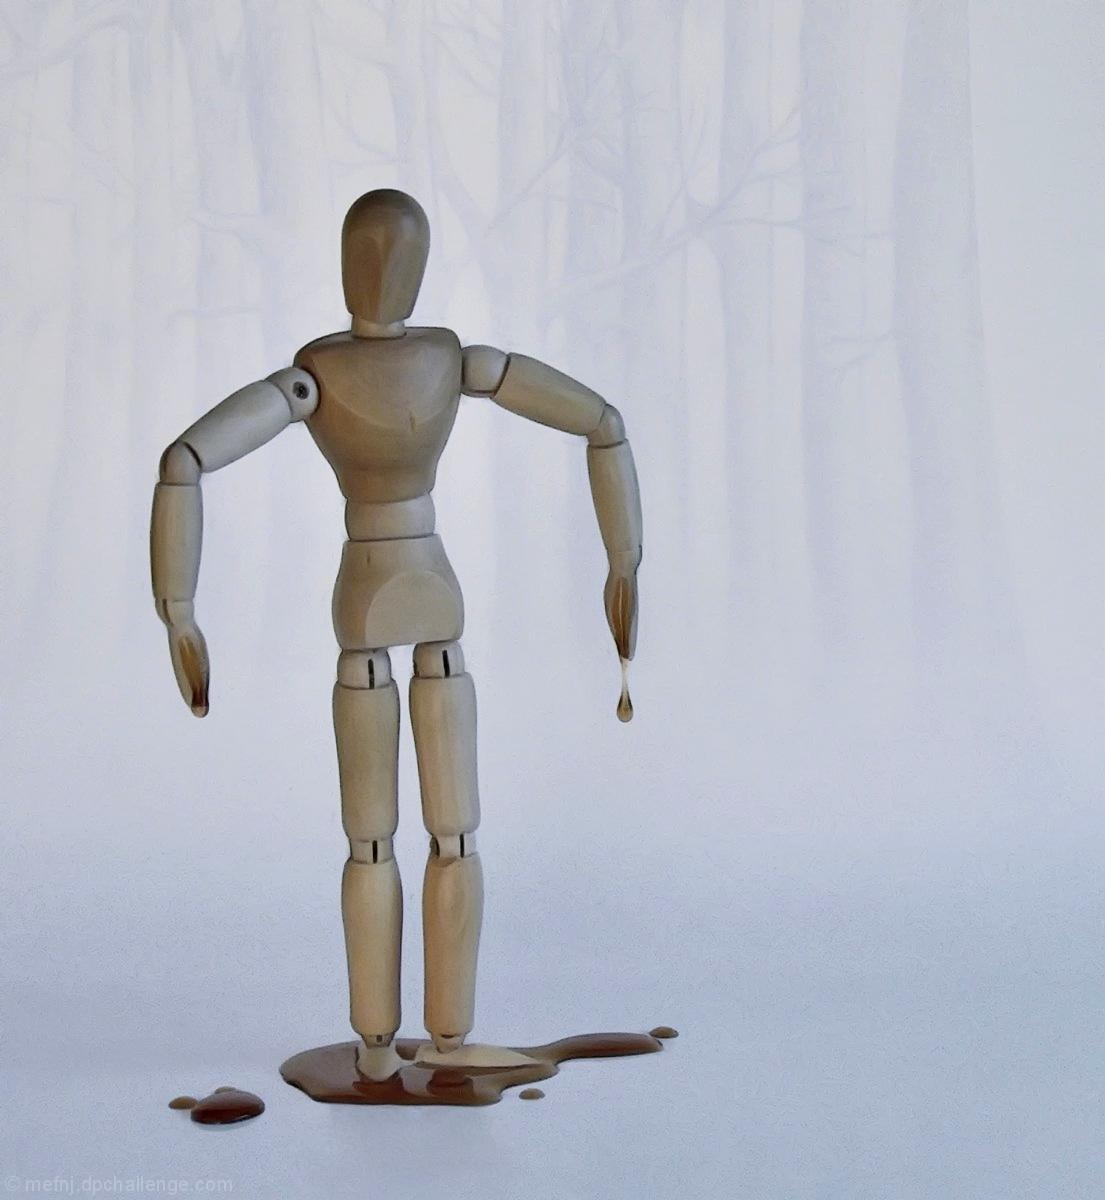 Woody cursed his Maple tree genes whenever sap running season rolled around